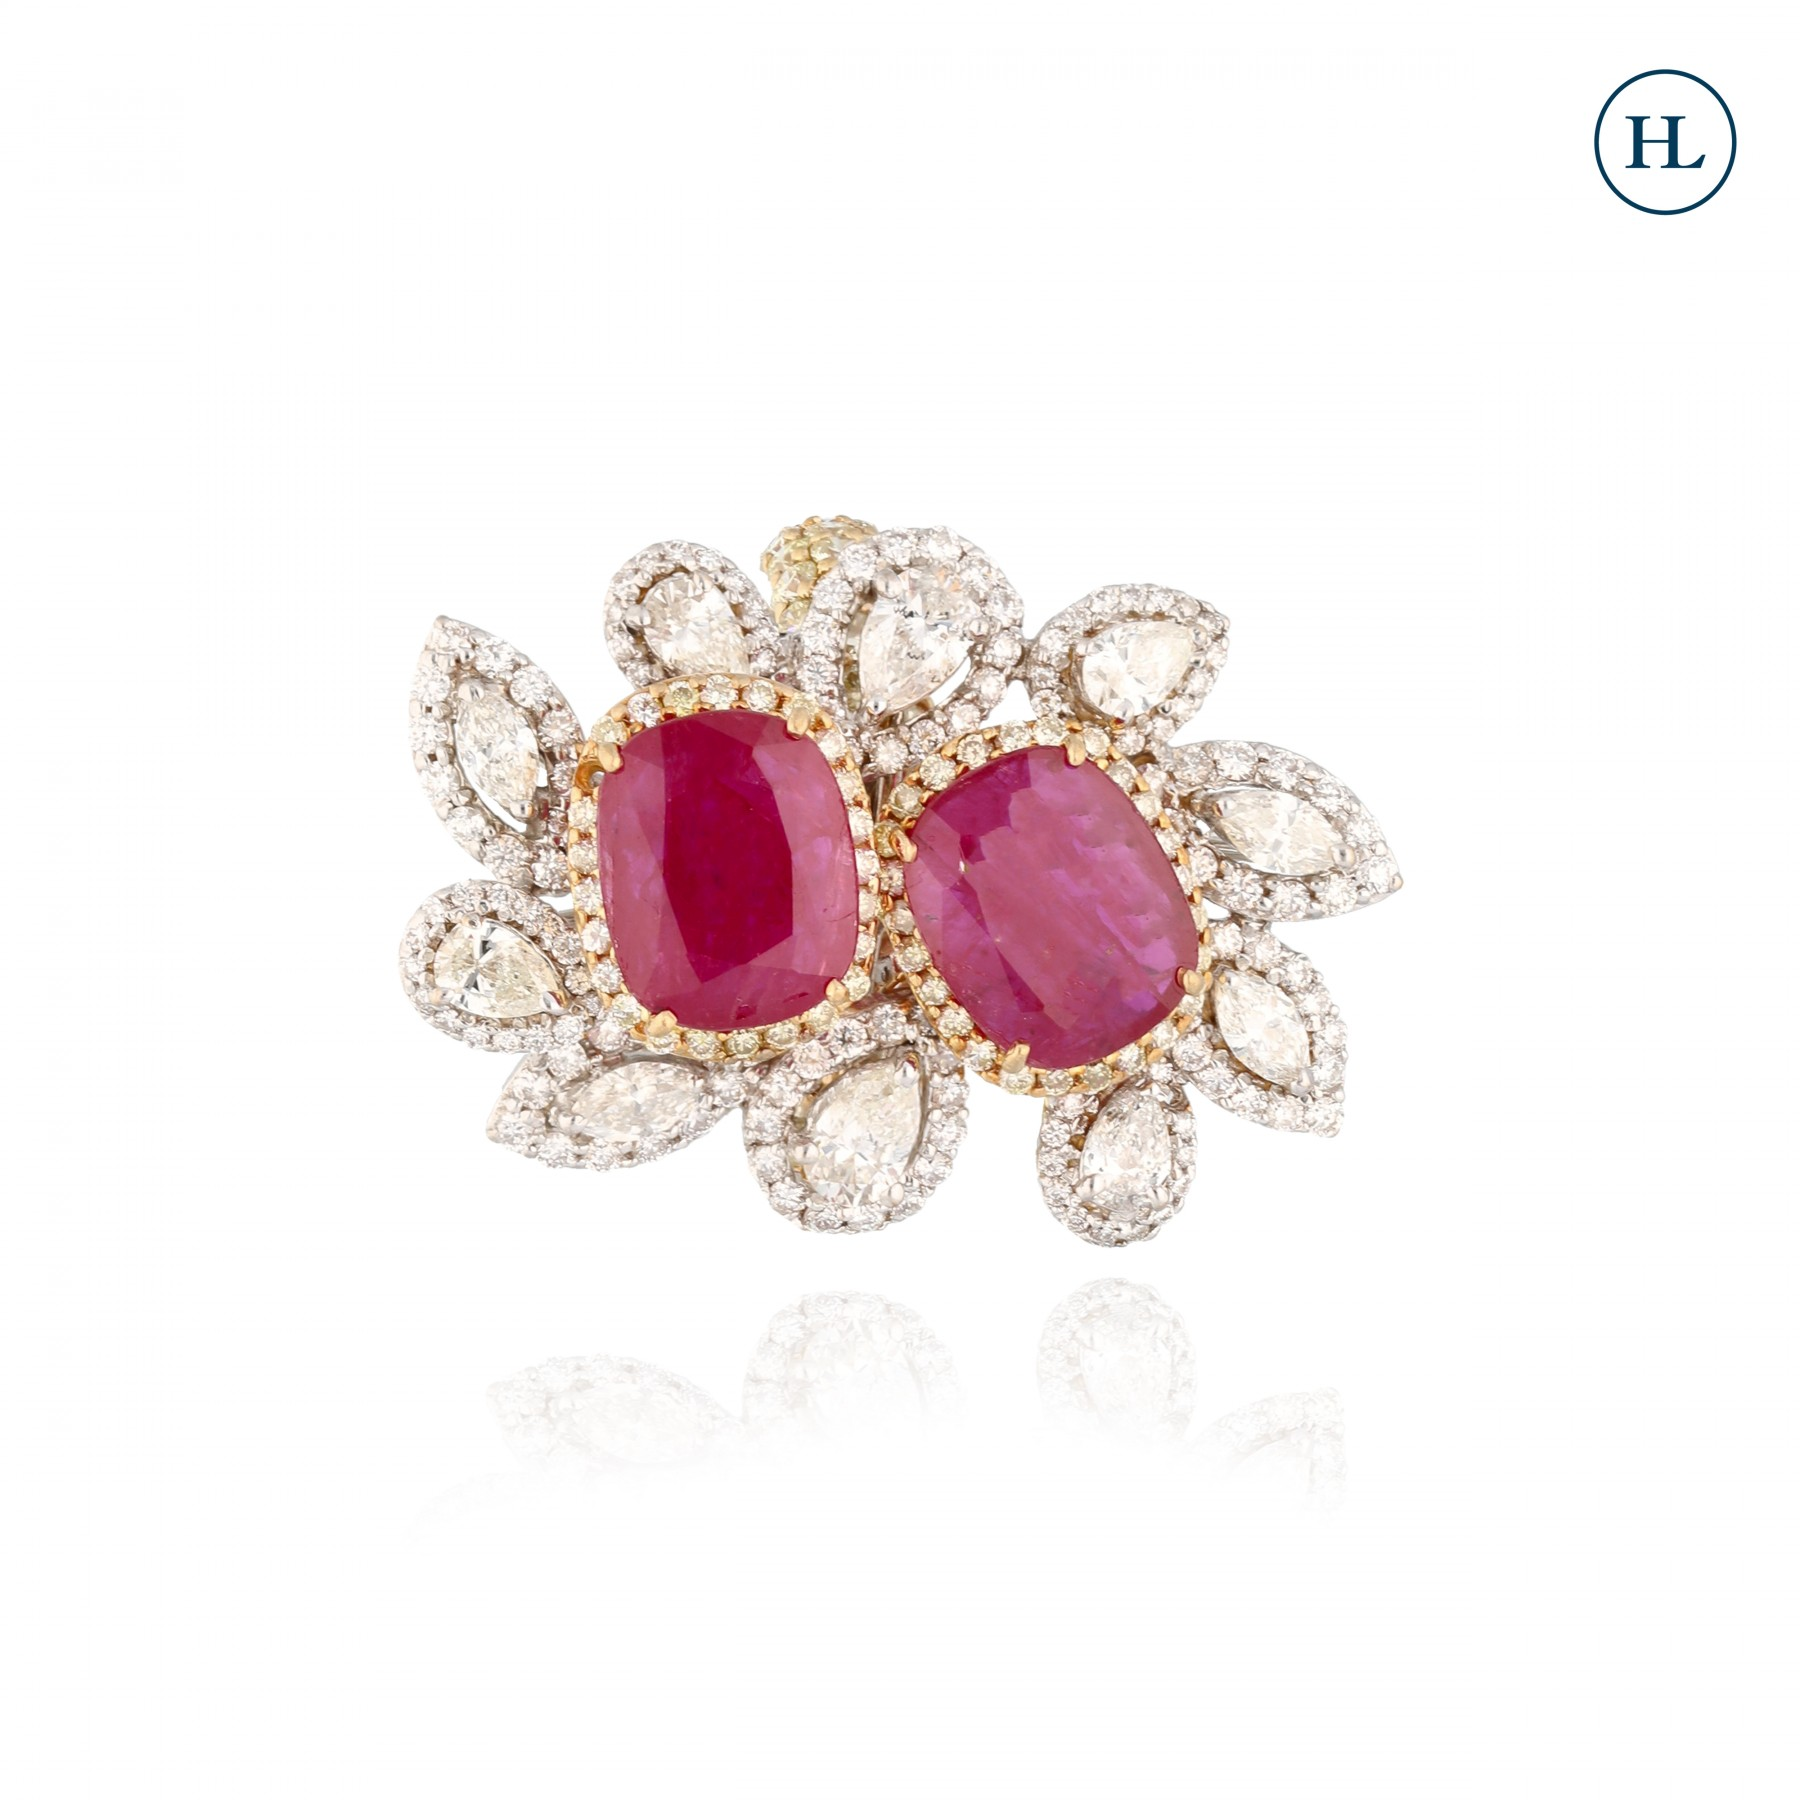 Marquise Diamond Ruby Ring